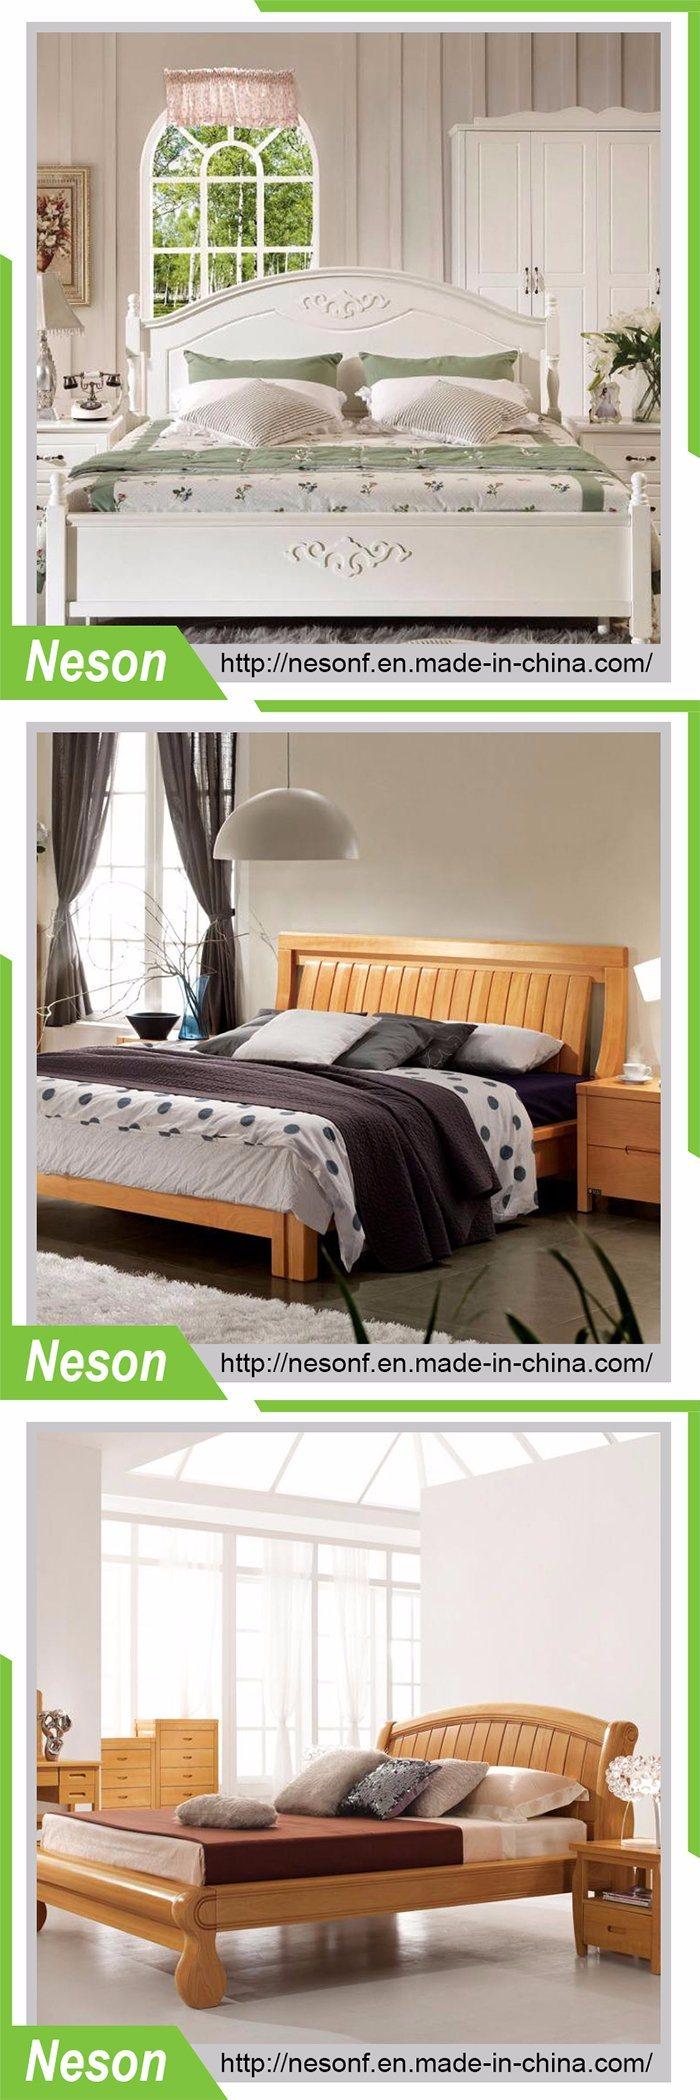 Flexica multicolores de pared artesanal camas plegables (HX-8NR1014 ...